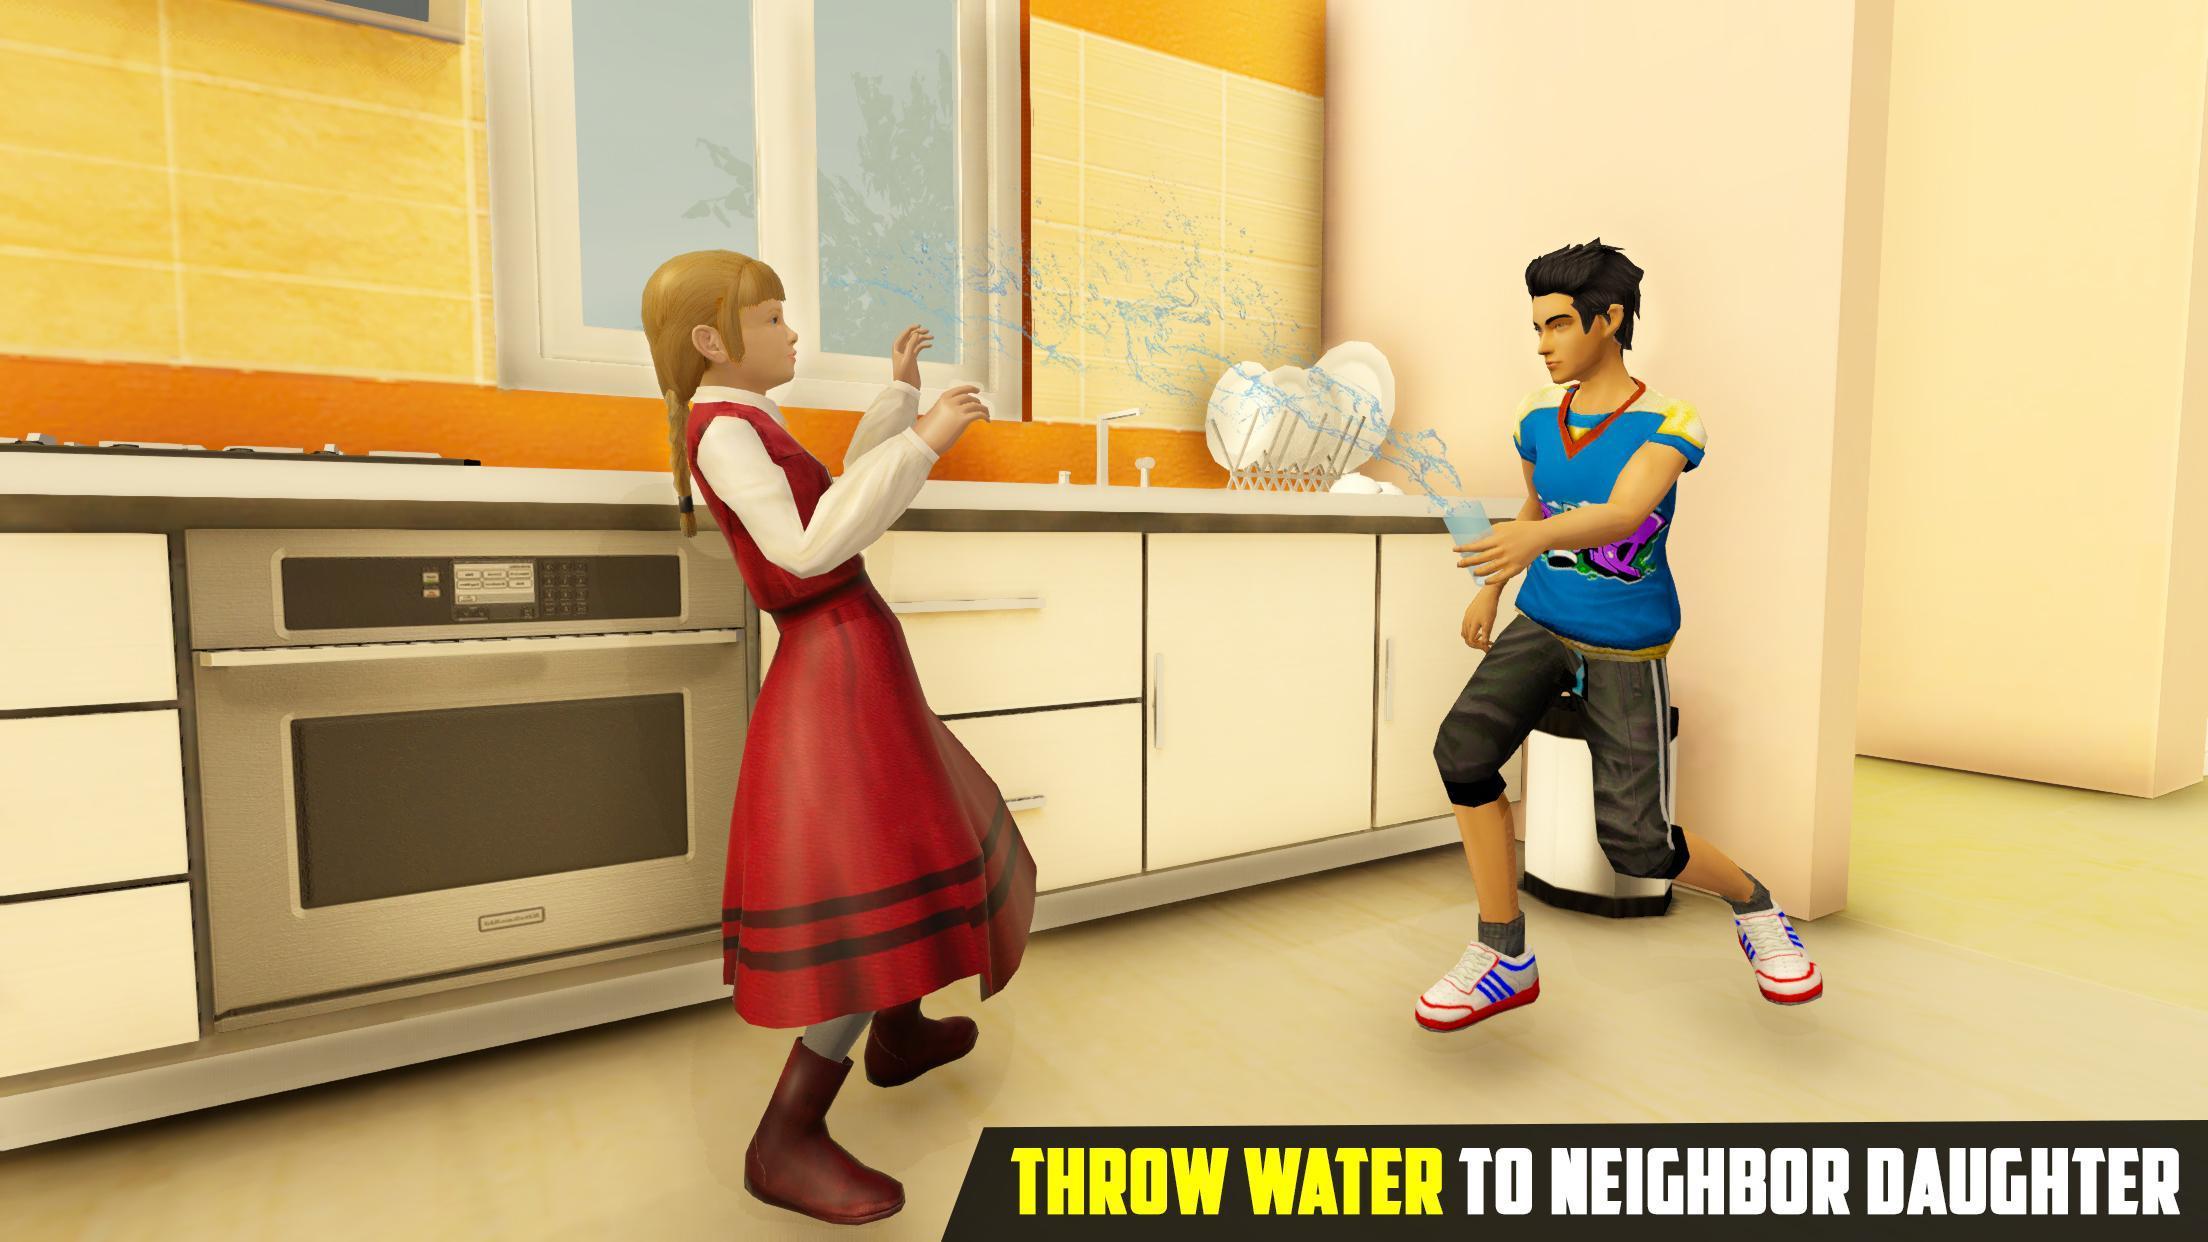 Virtual Bully Boys Next Angry Neighbor 1.4 Screenshot 8